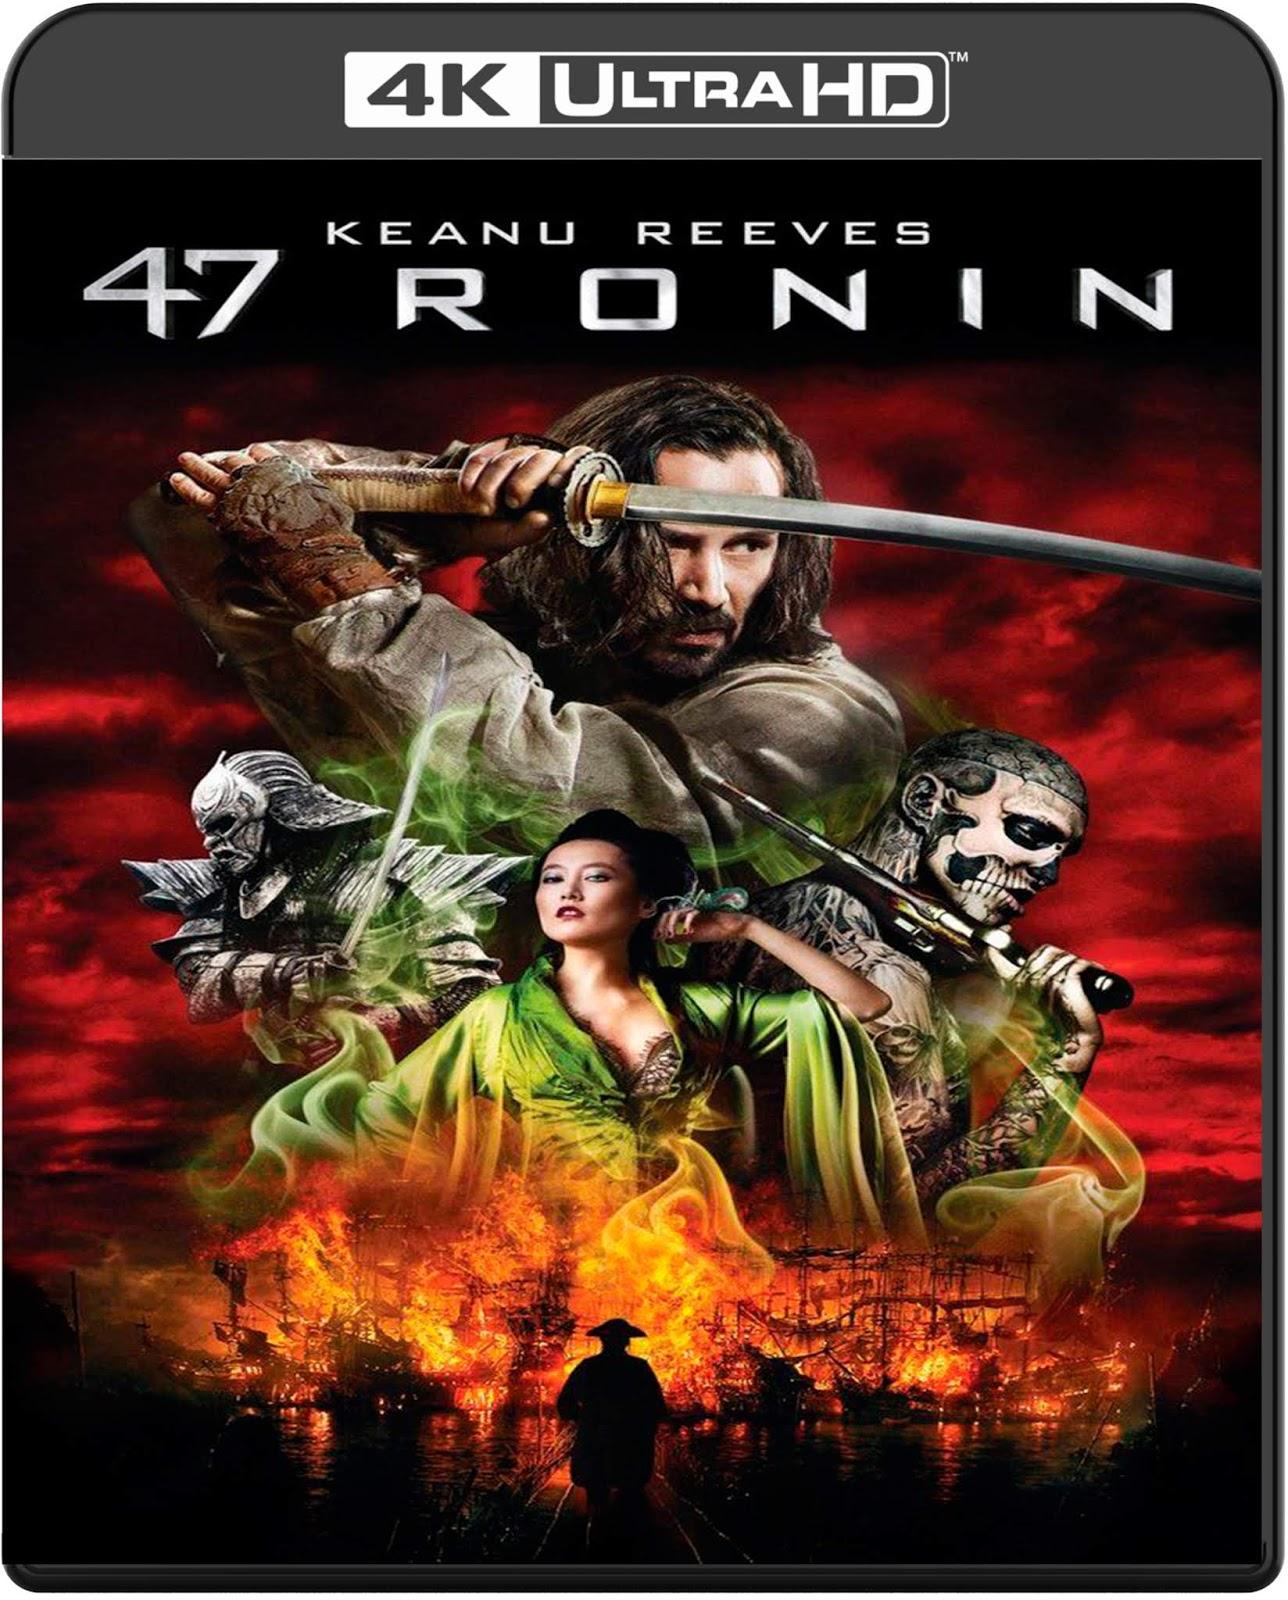 47 Ronin [2013] [UHD] [2160p] [Latino]